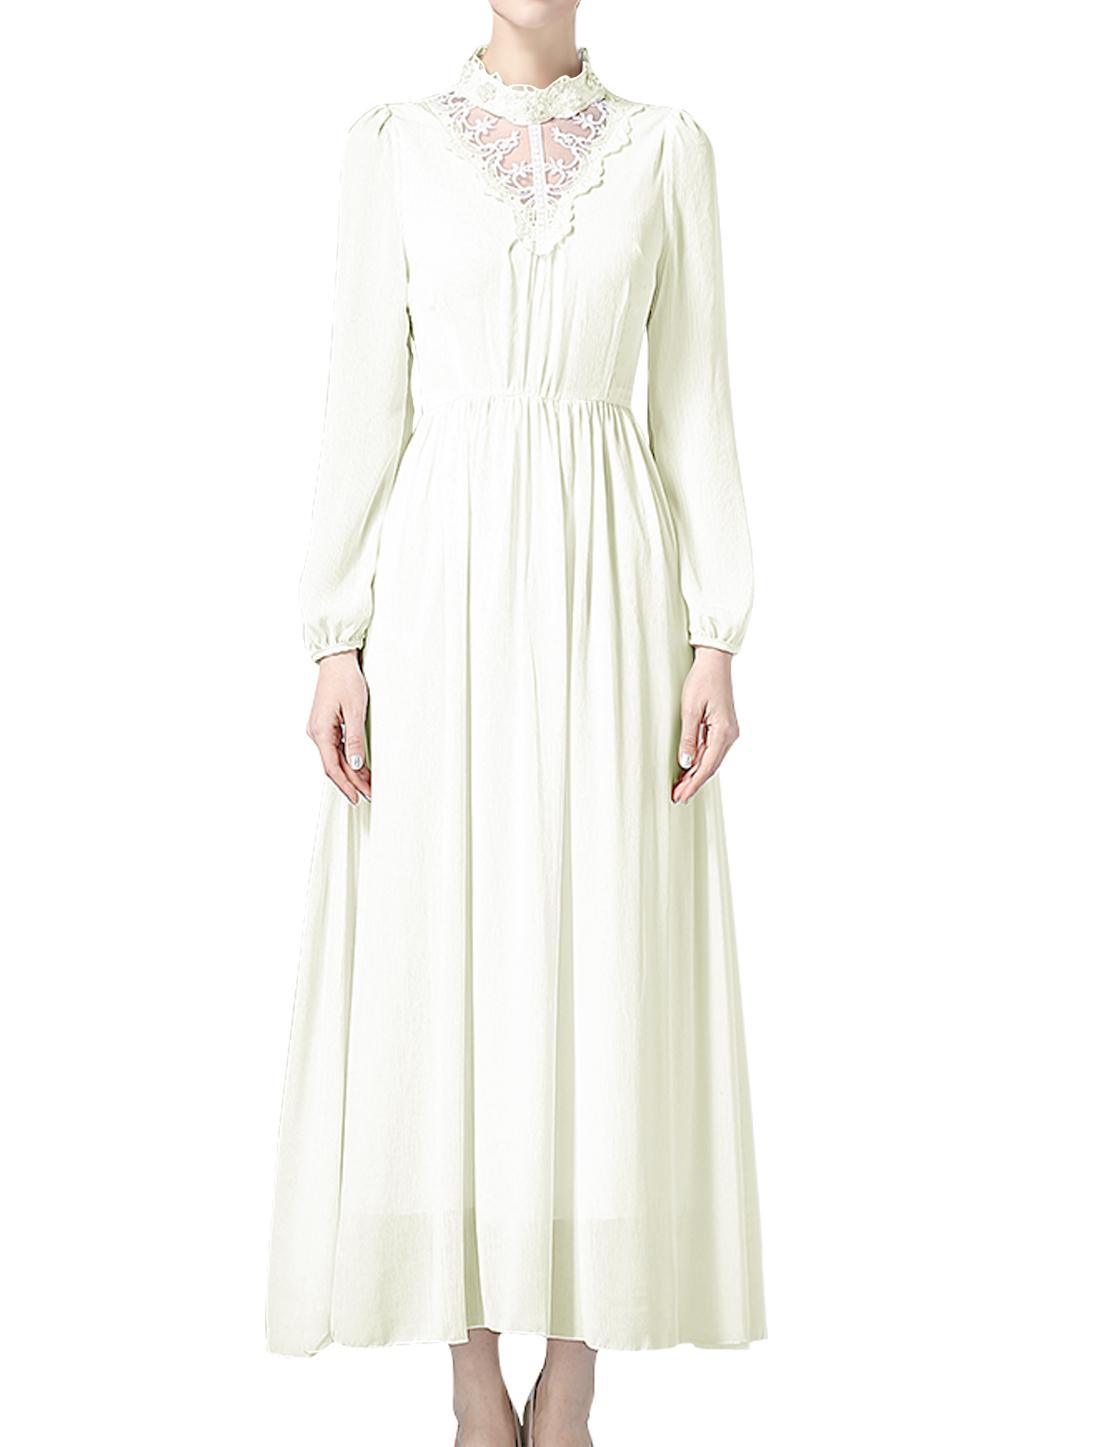 Lady Beaded Mock Neck Long Sleeves Crochet Mesh Panel Chiffon Maxi Dress White M